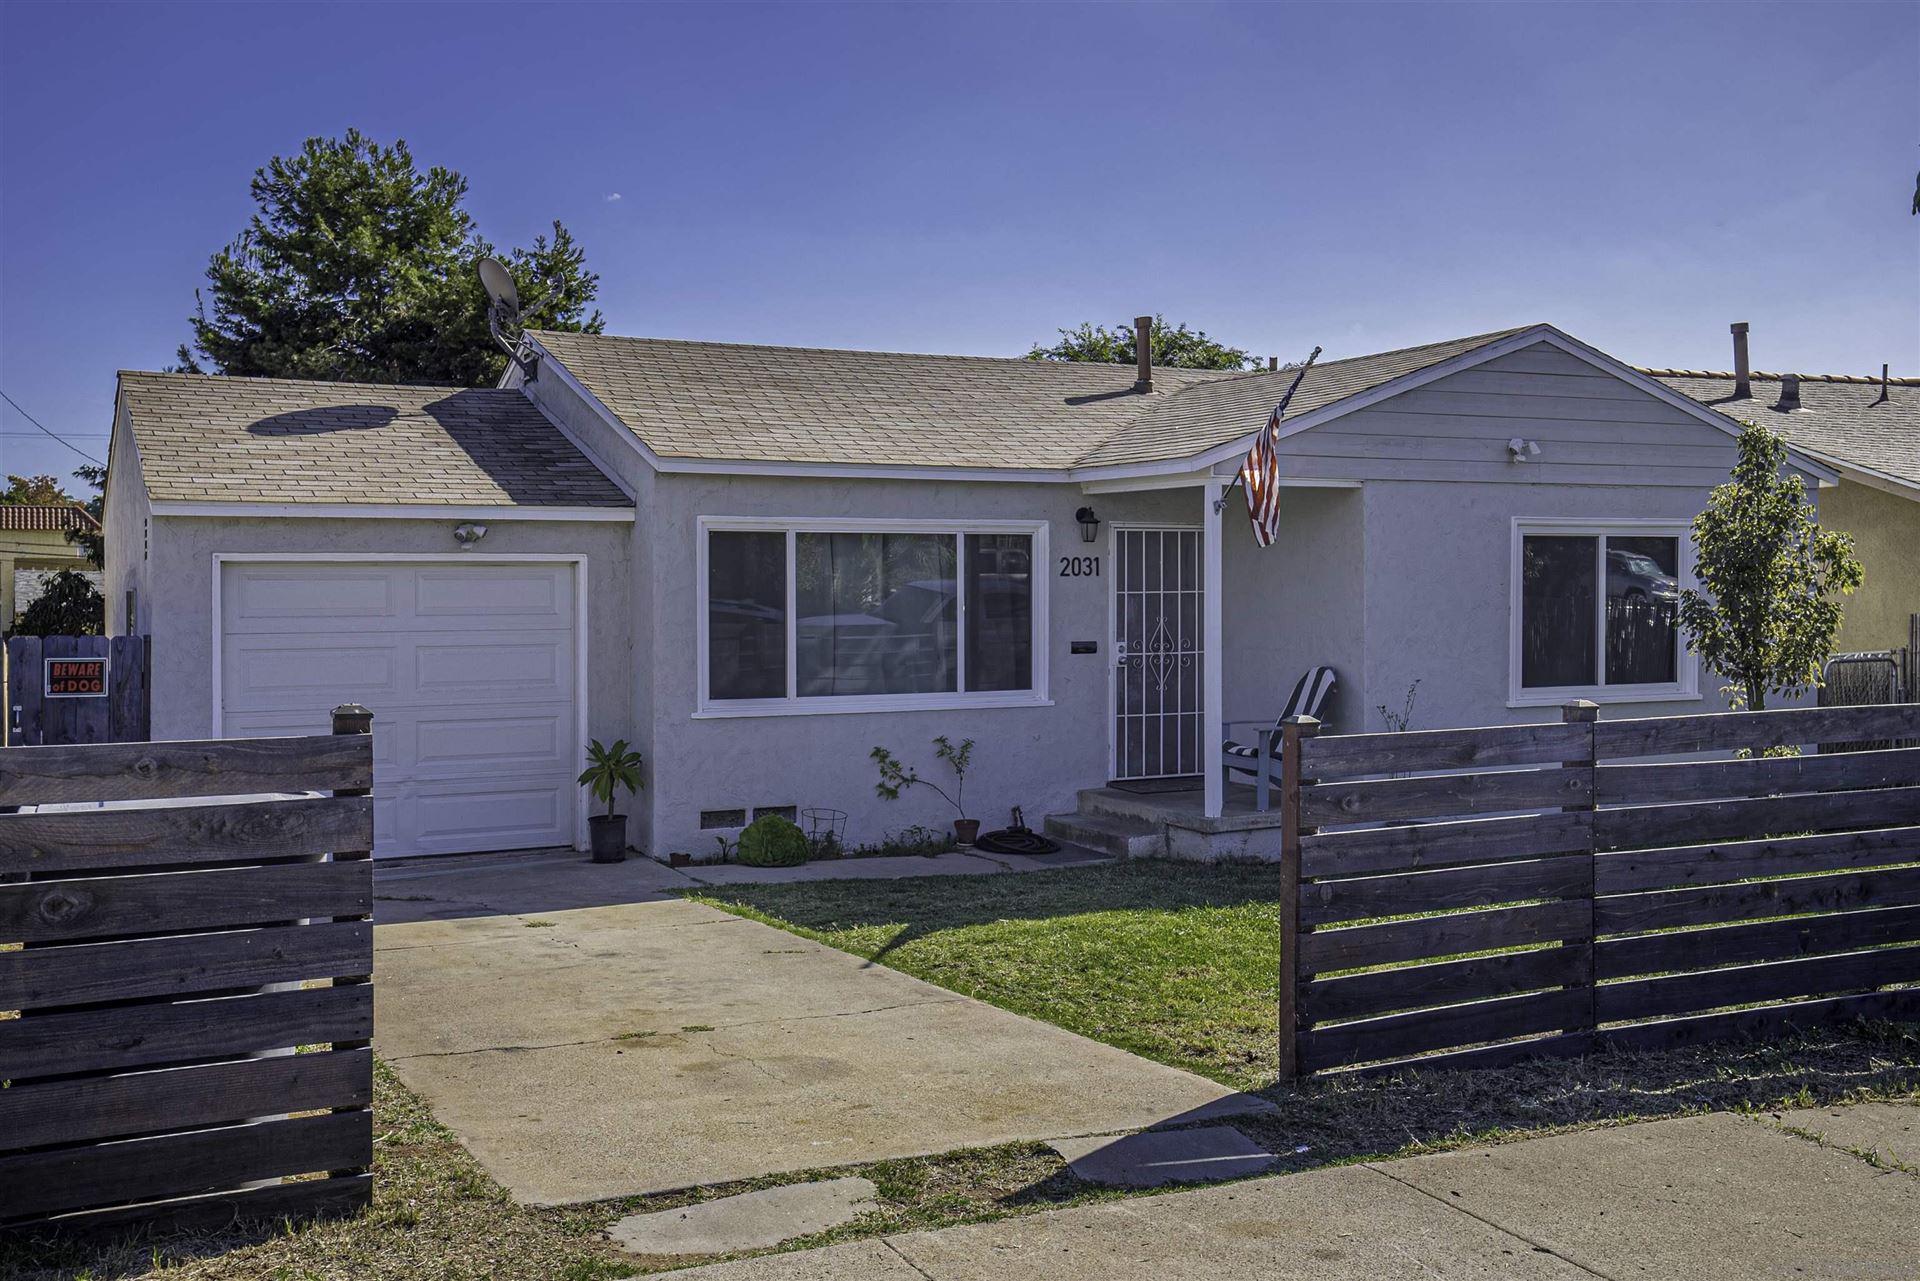 2031 K Ave, National City, CA 91950 - #: 210029363